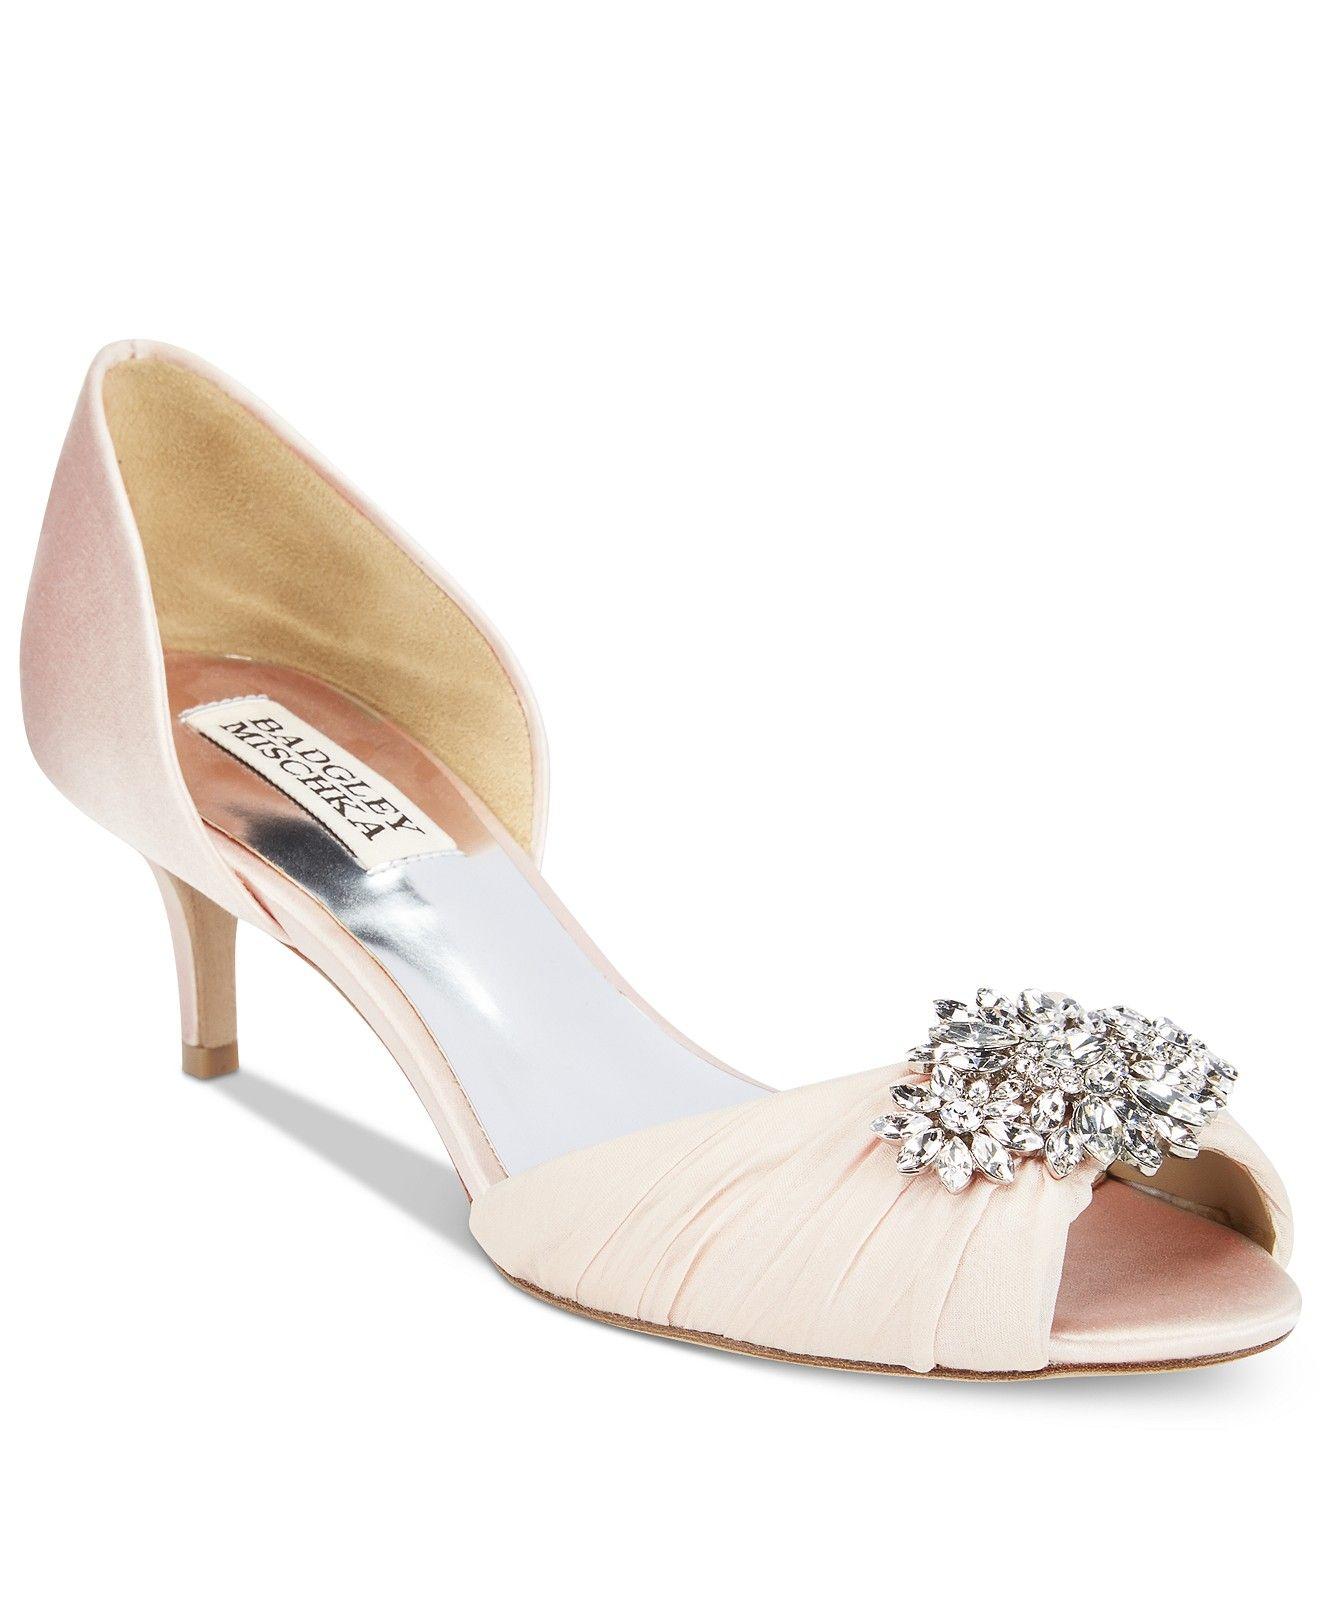 Badgley Mischka Caitlin Embellished D Orsay Pumps Evening Bridal Shoes Macy S Wedding Shoes Heels Bridal Shoes Boho Wedding Shoes